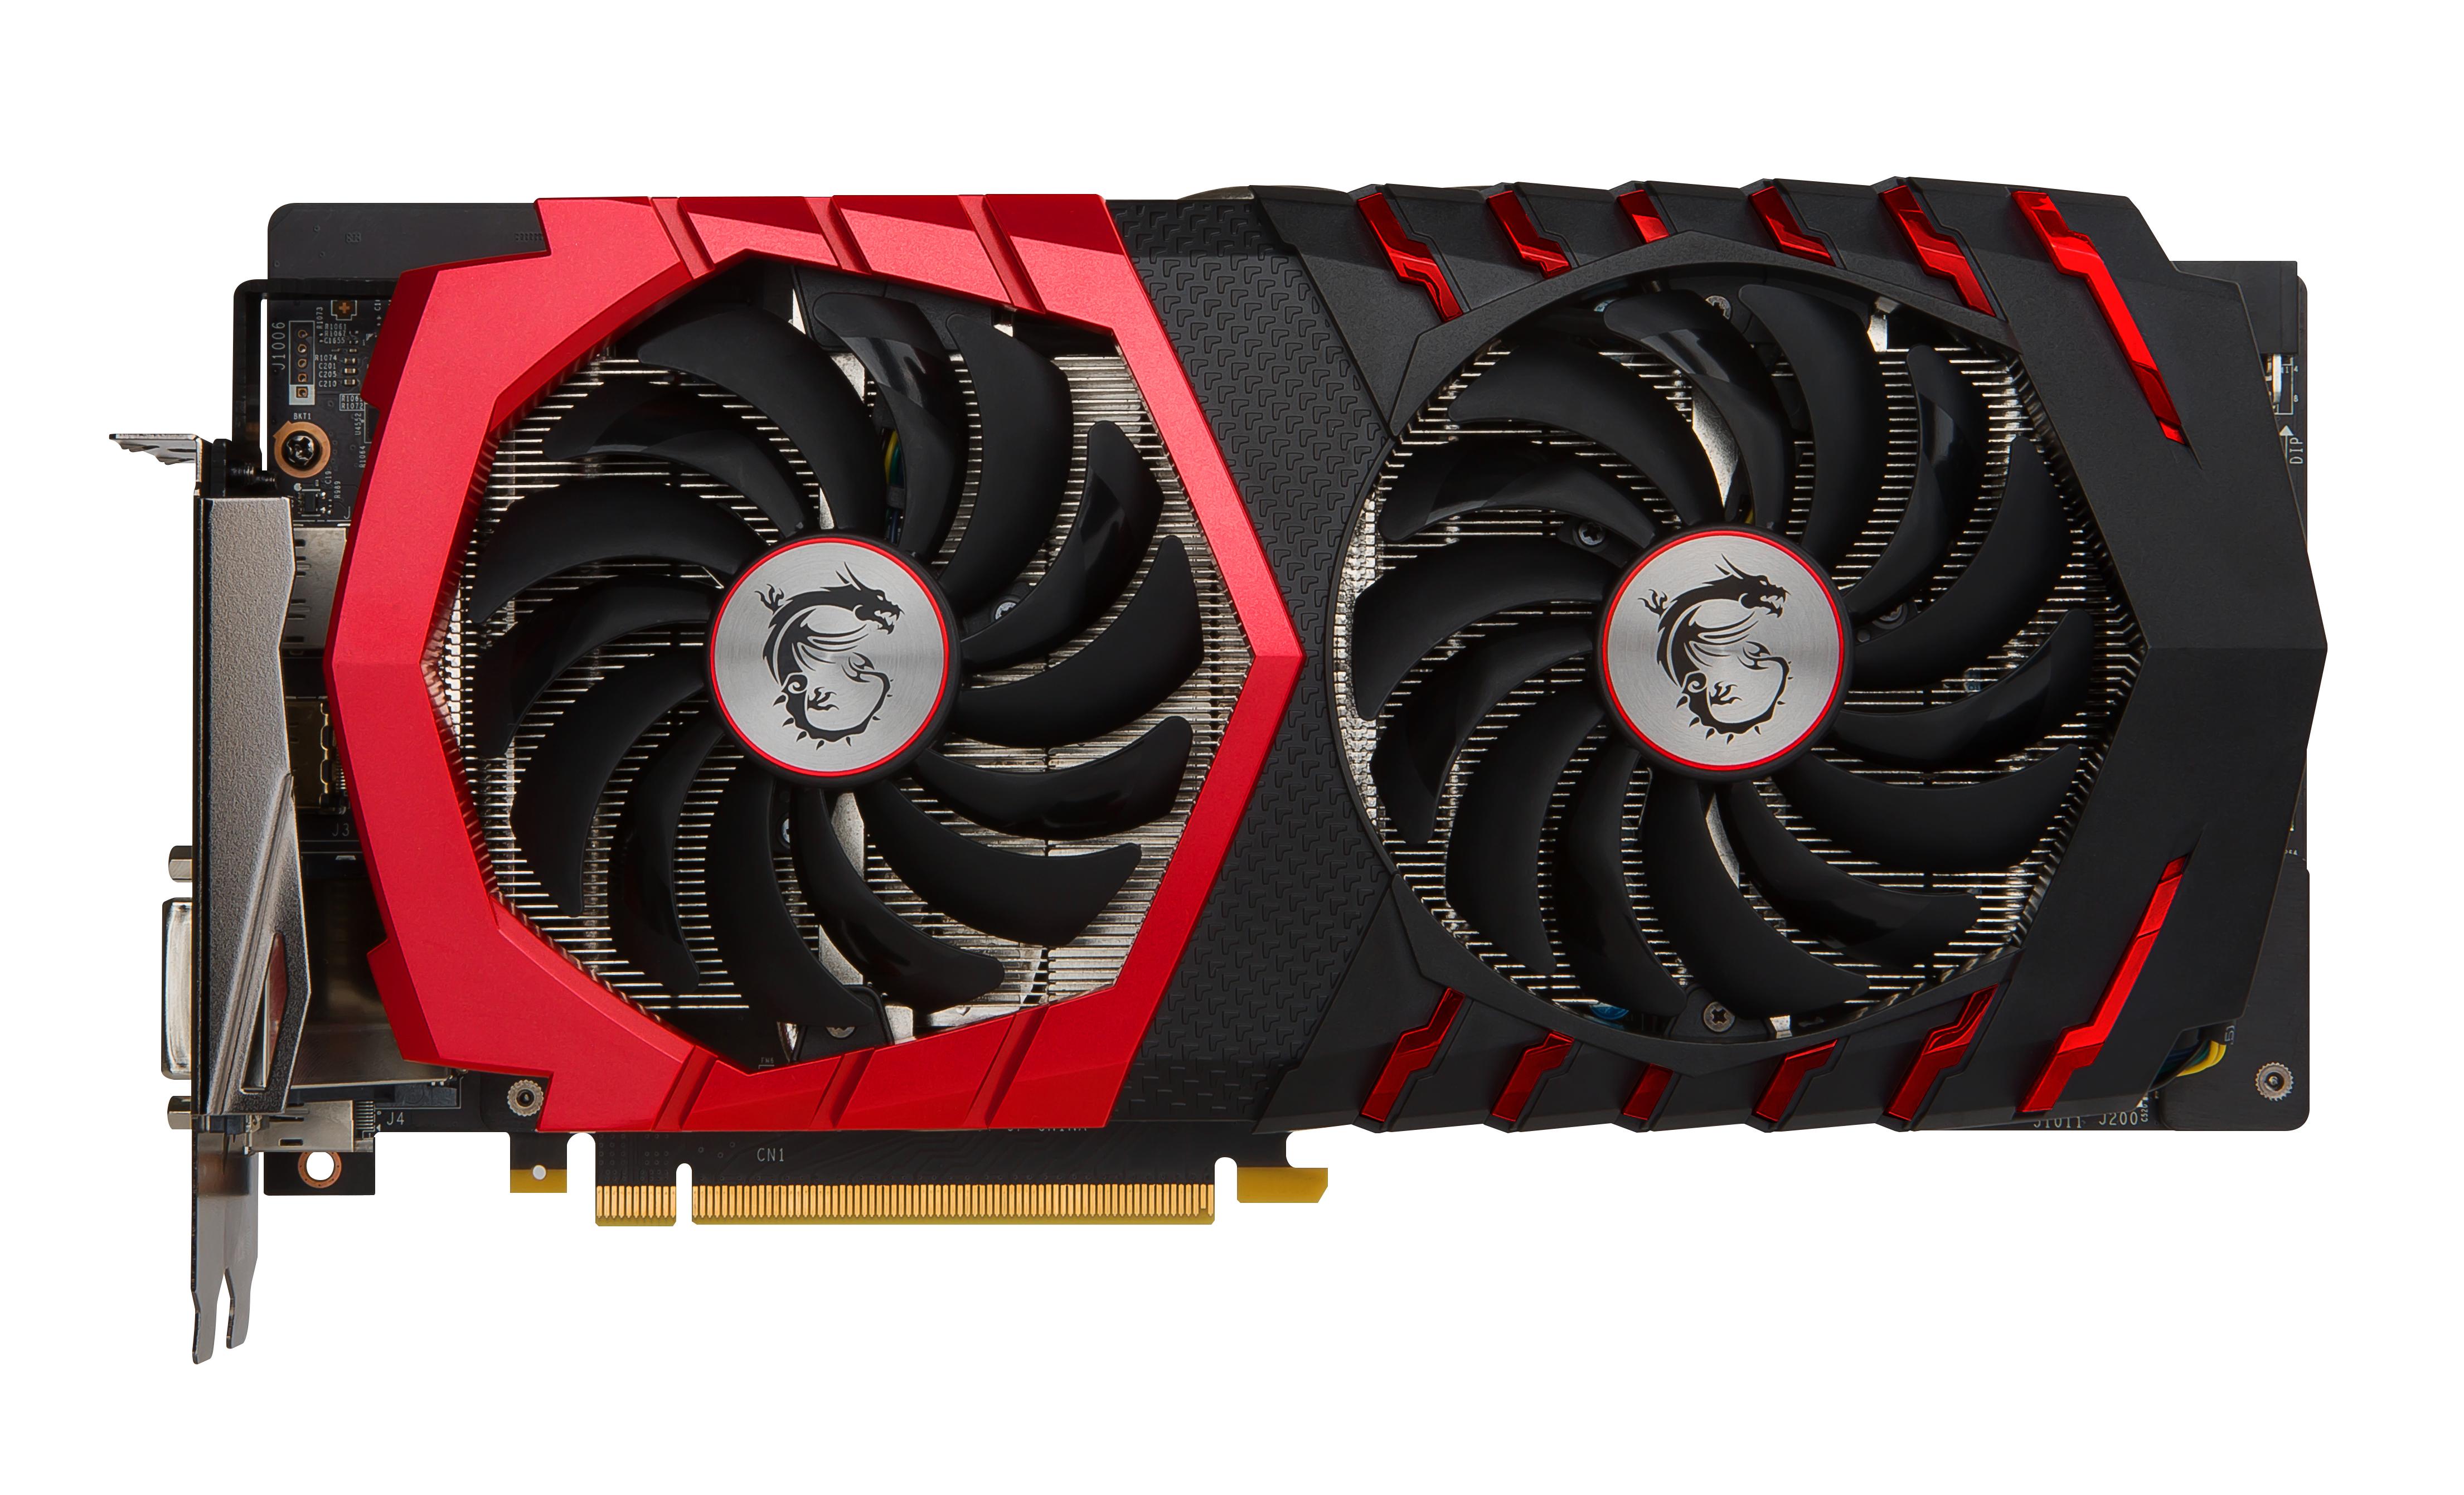 MSI GTX 1060 GAMING 3G GeForce GTX 1060 3GB GDDR5 graphics card